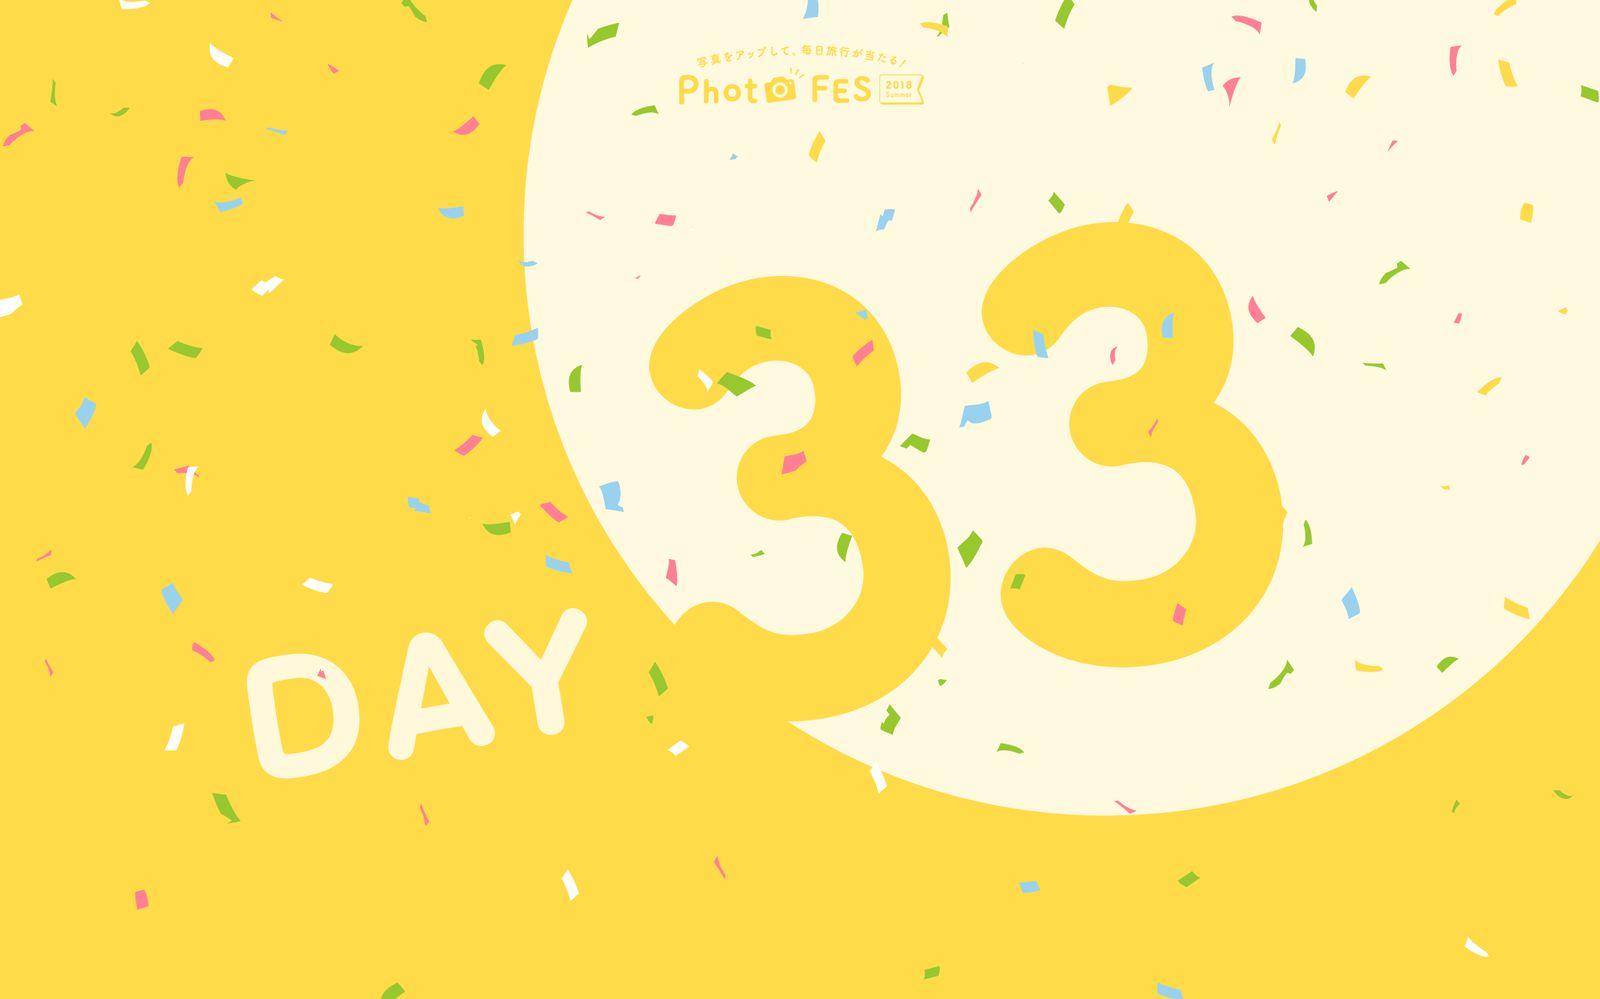 【DAY33】「Photo FES 2018」7月28日投稿分であたる賞品&受賞者発表